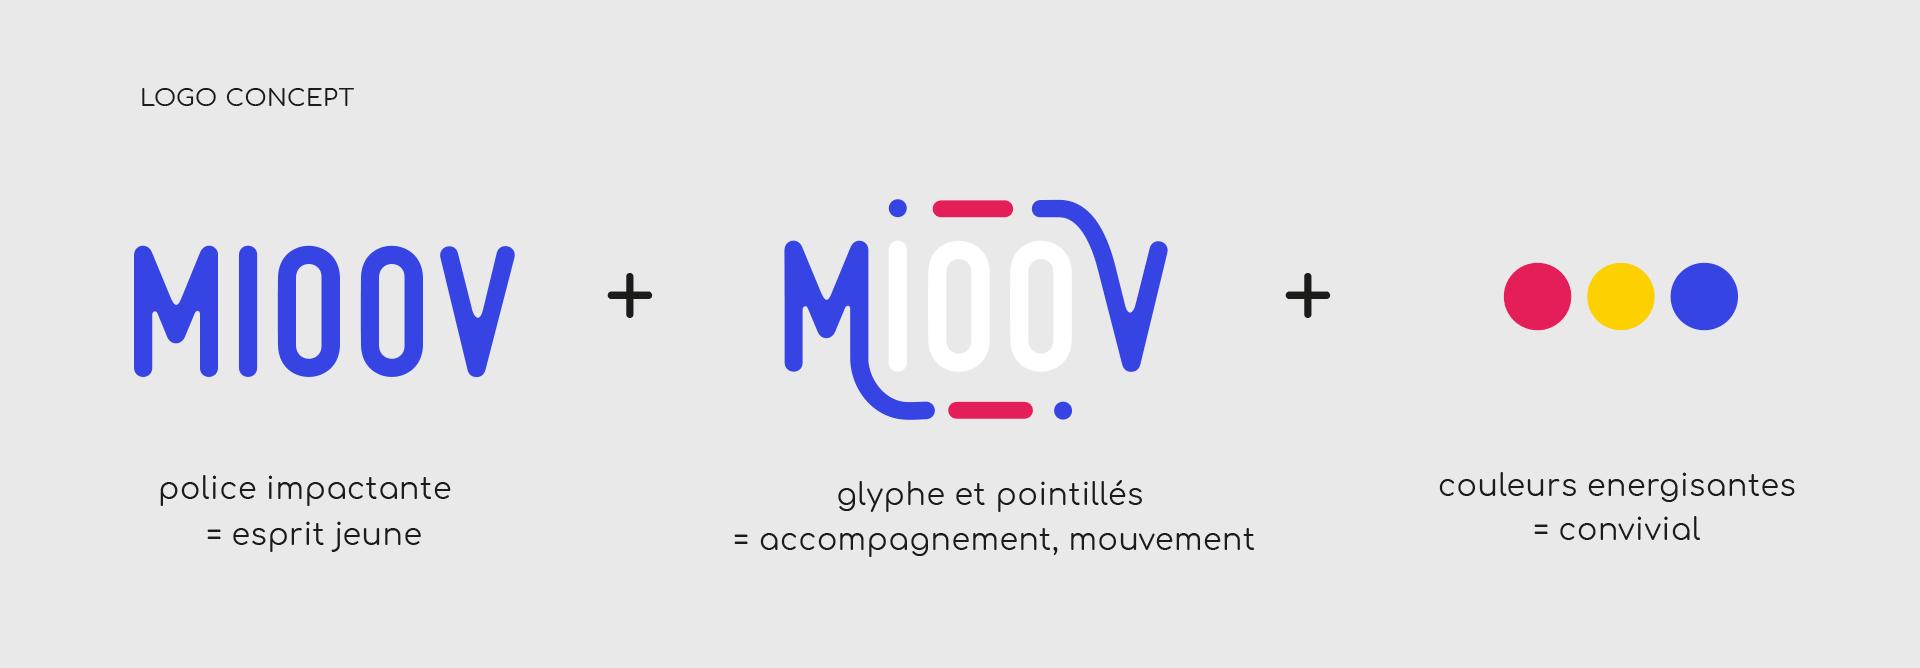 logo concept Mioov